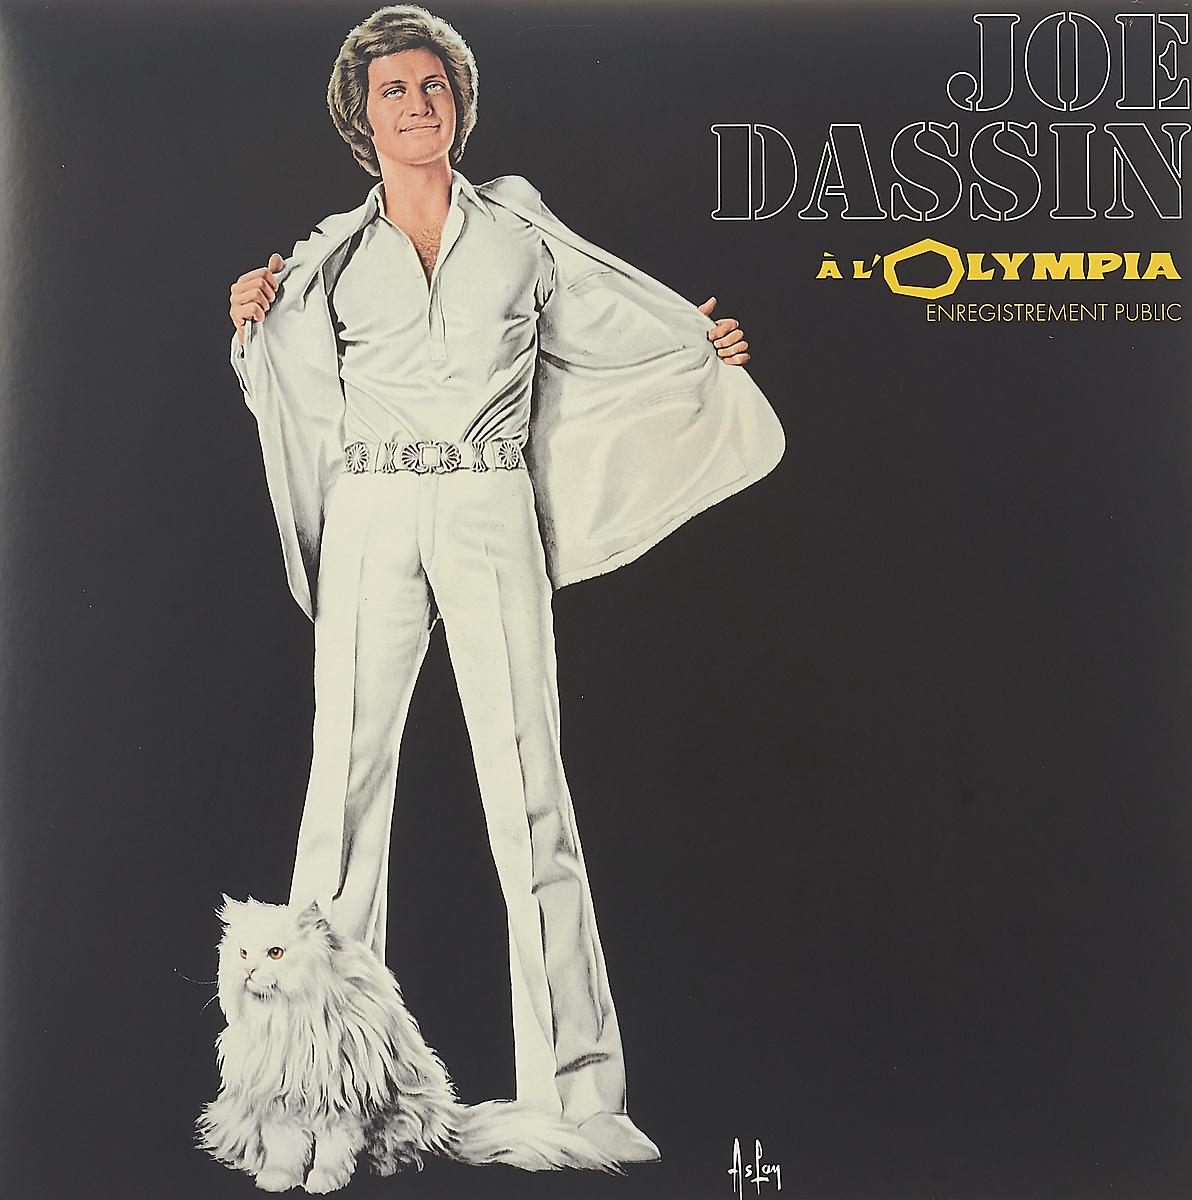 Джо Дассен Joe Dassin. A L'Olympia (2 LP) джо хендерсон joe henderson mode for joe lp